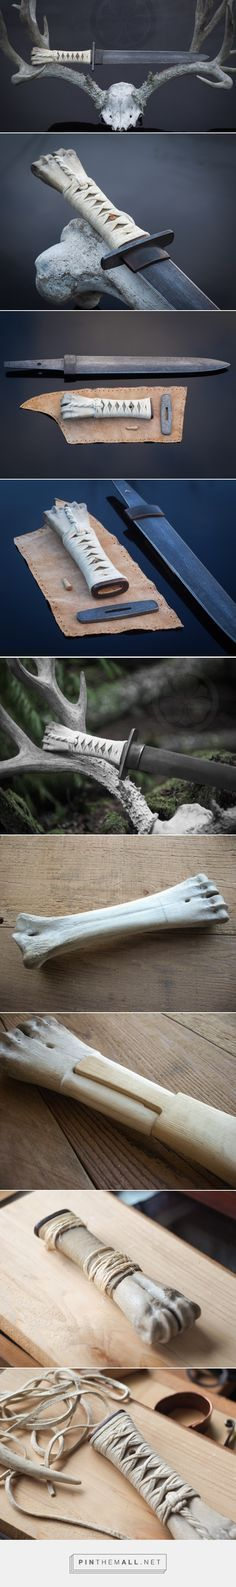 The Bone Dagger - Crossed Heart Forge